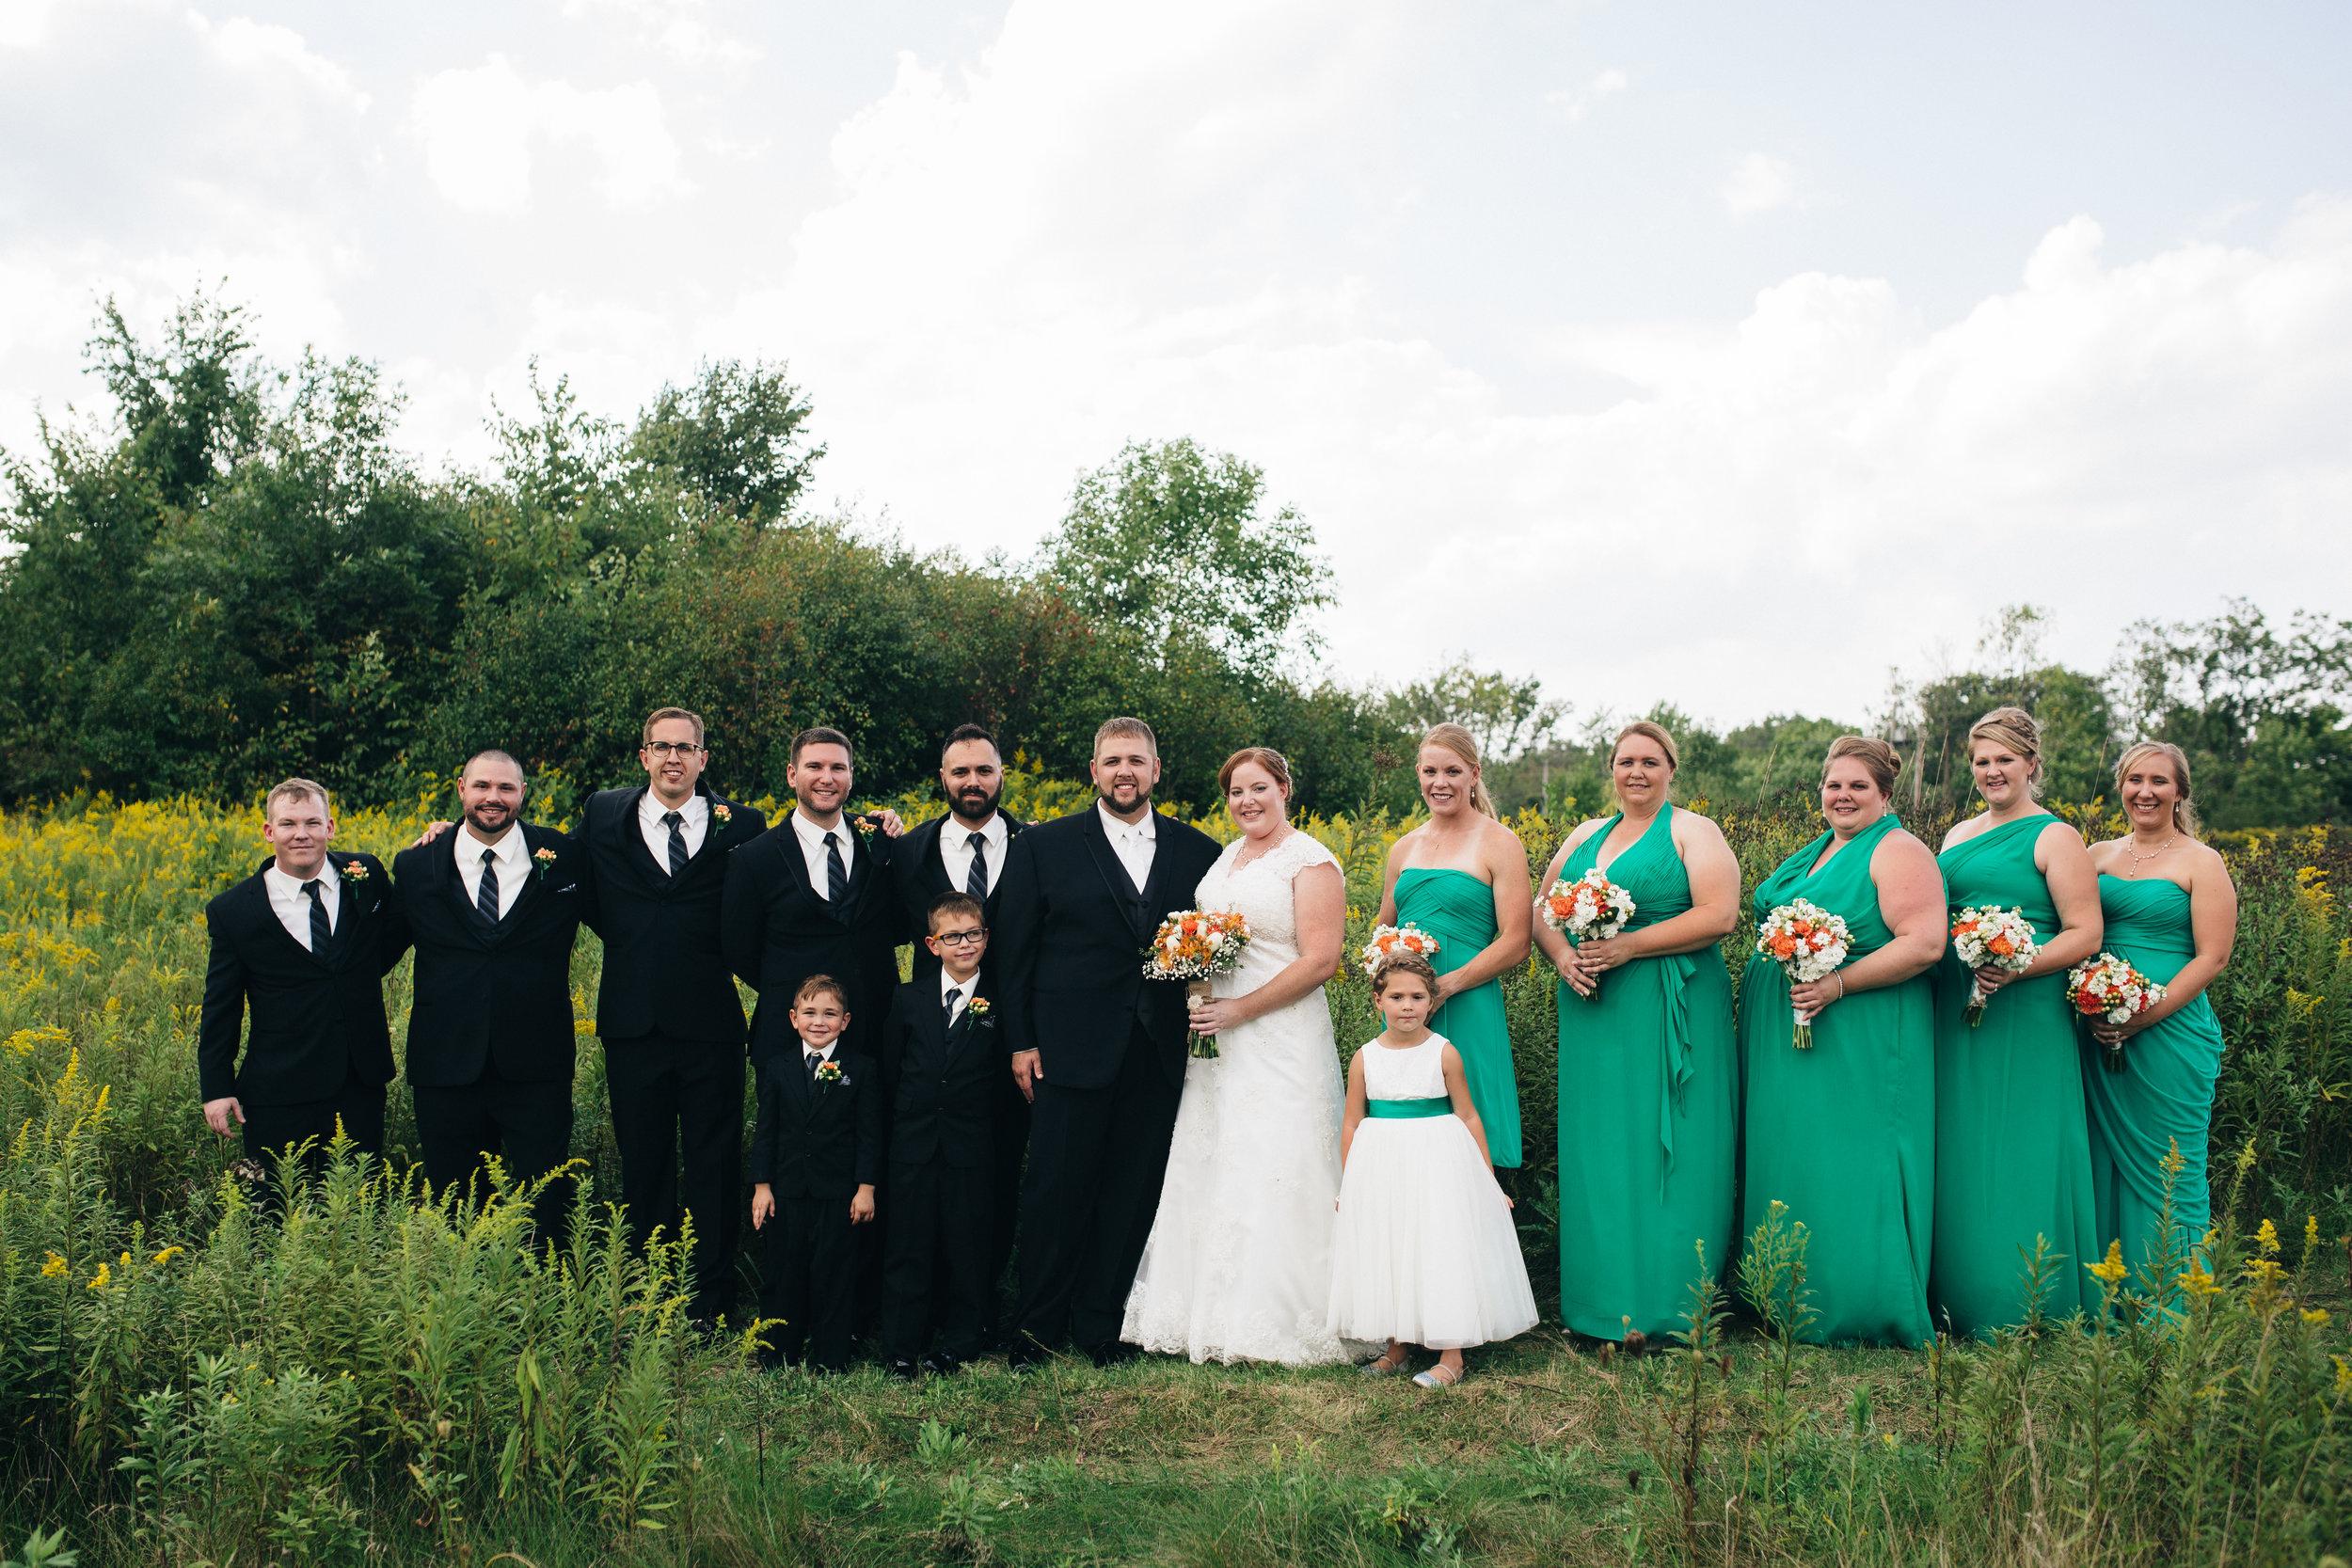 Wedding party at Walden Inn & Spa near Cleveland, Ohio.